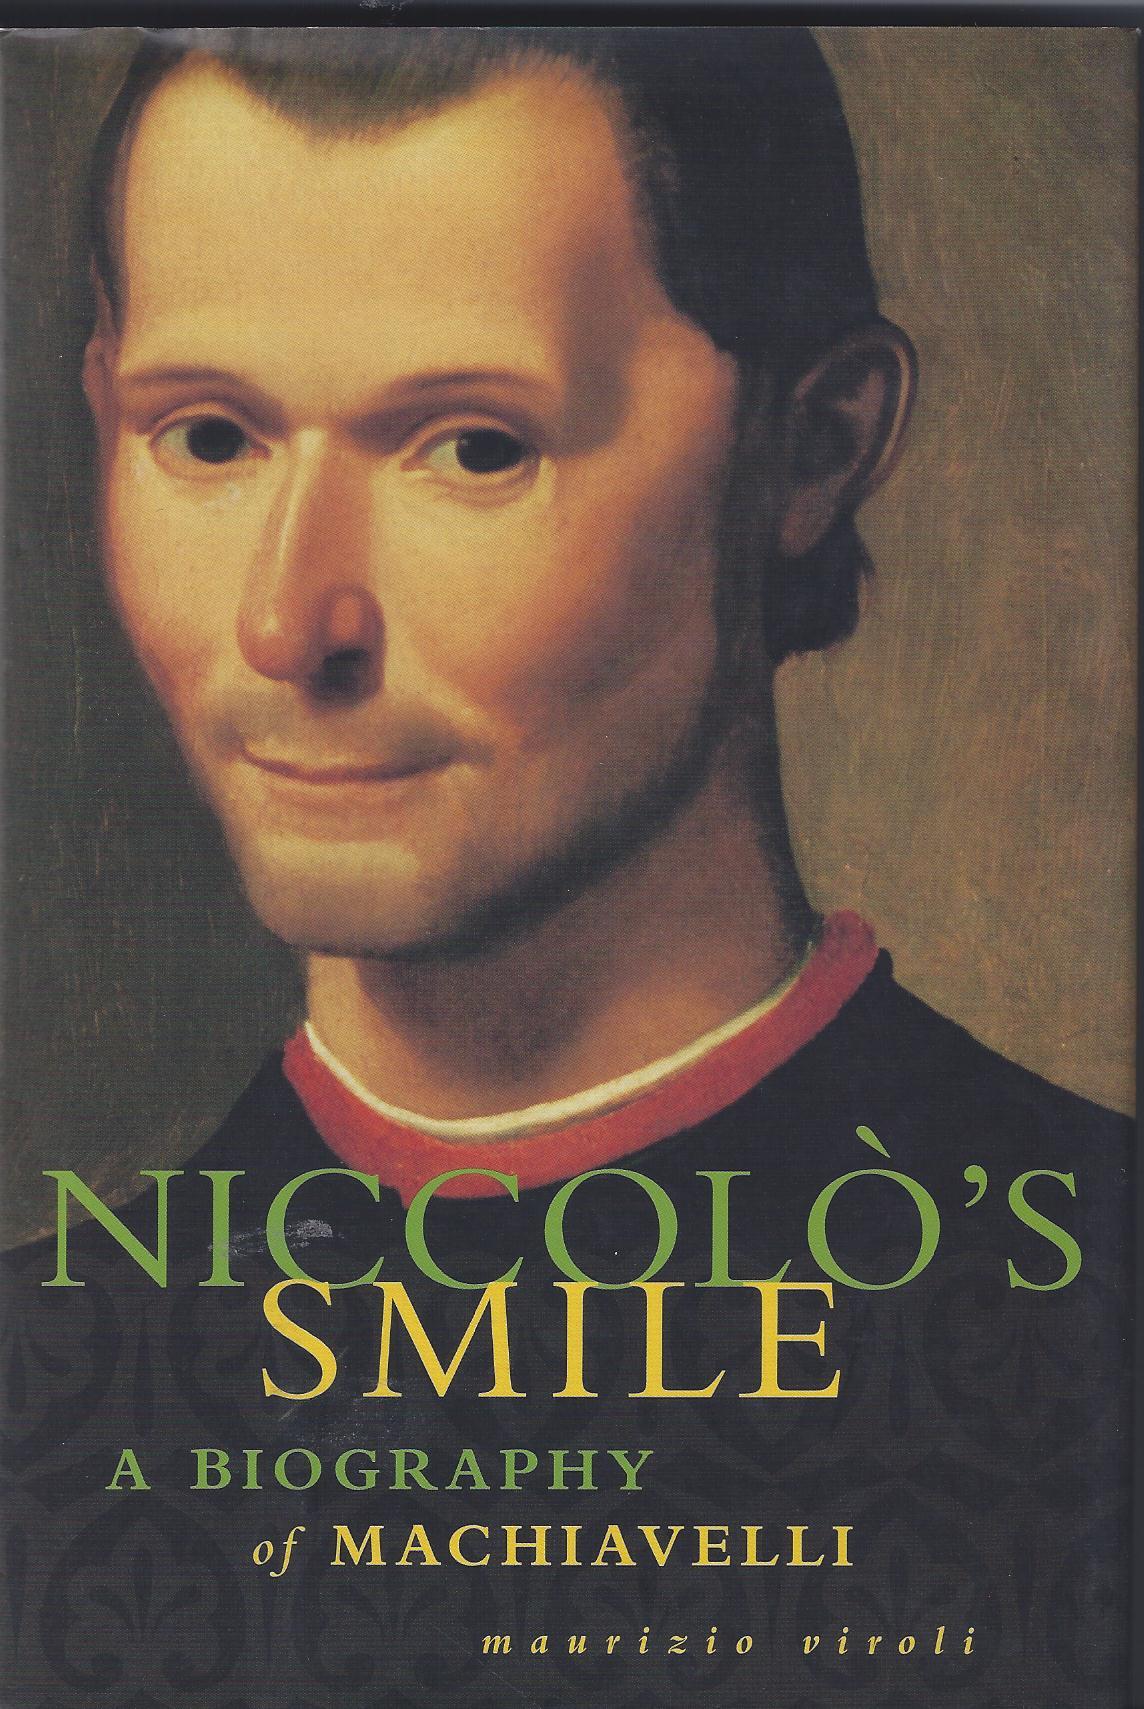 Macciavelli biography